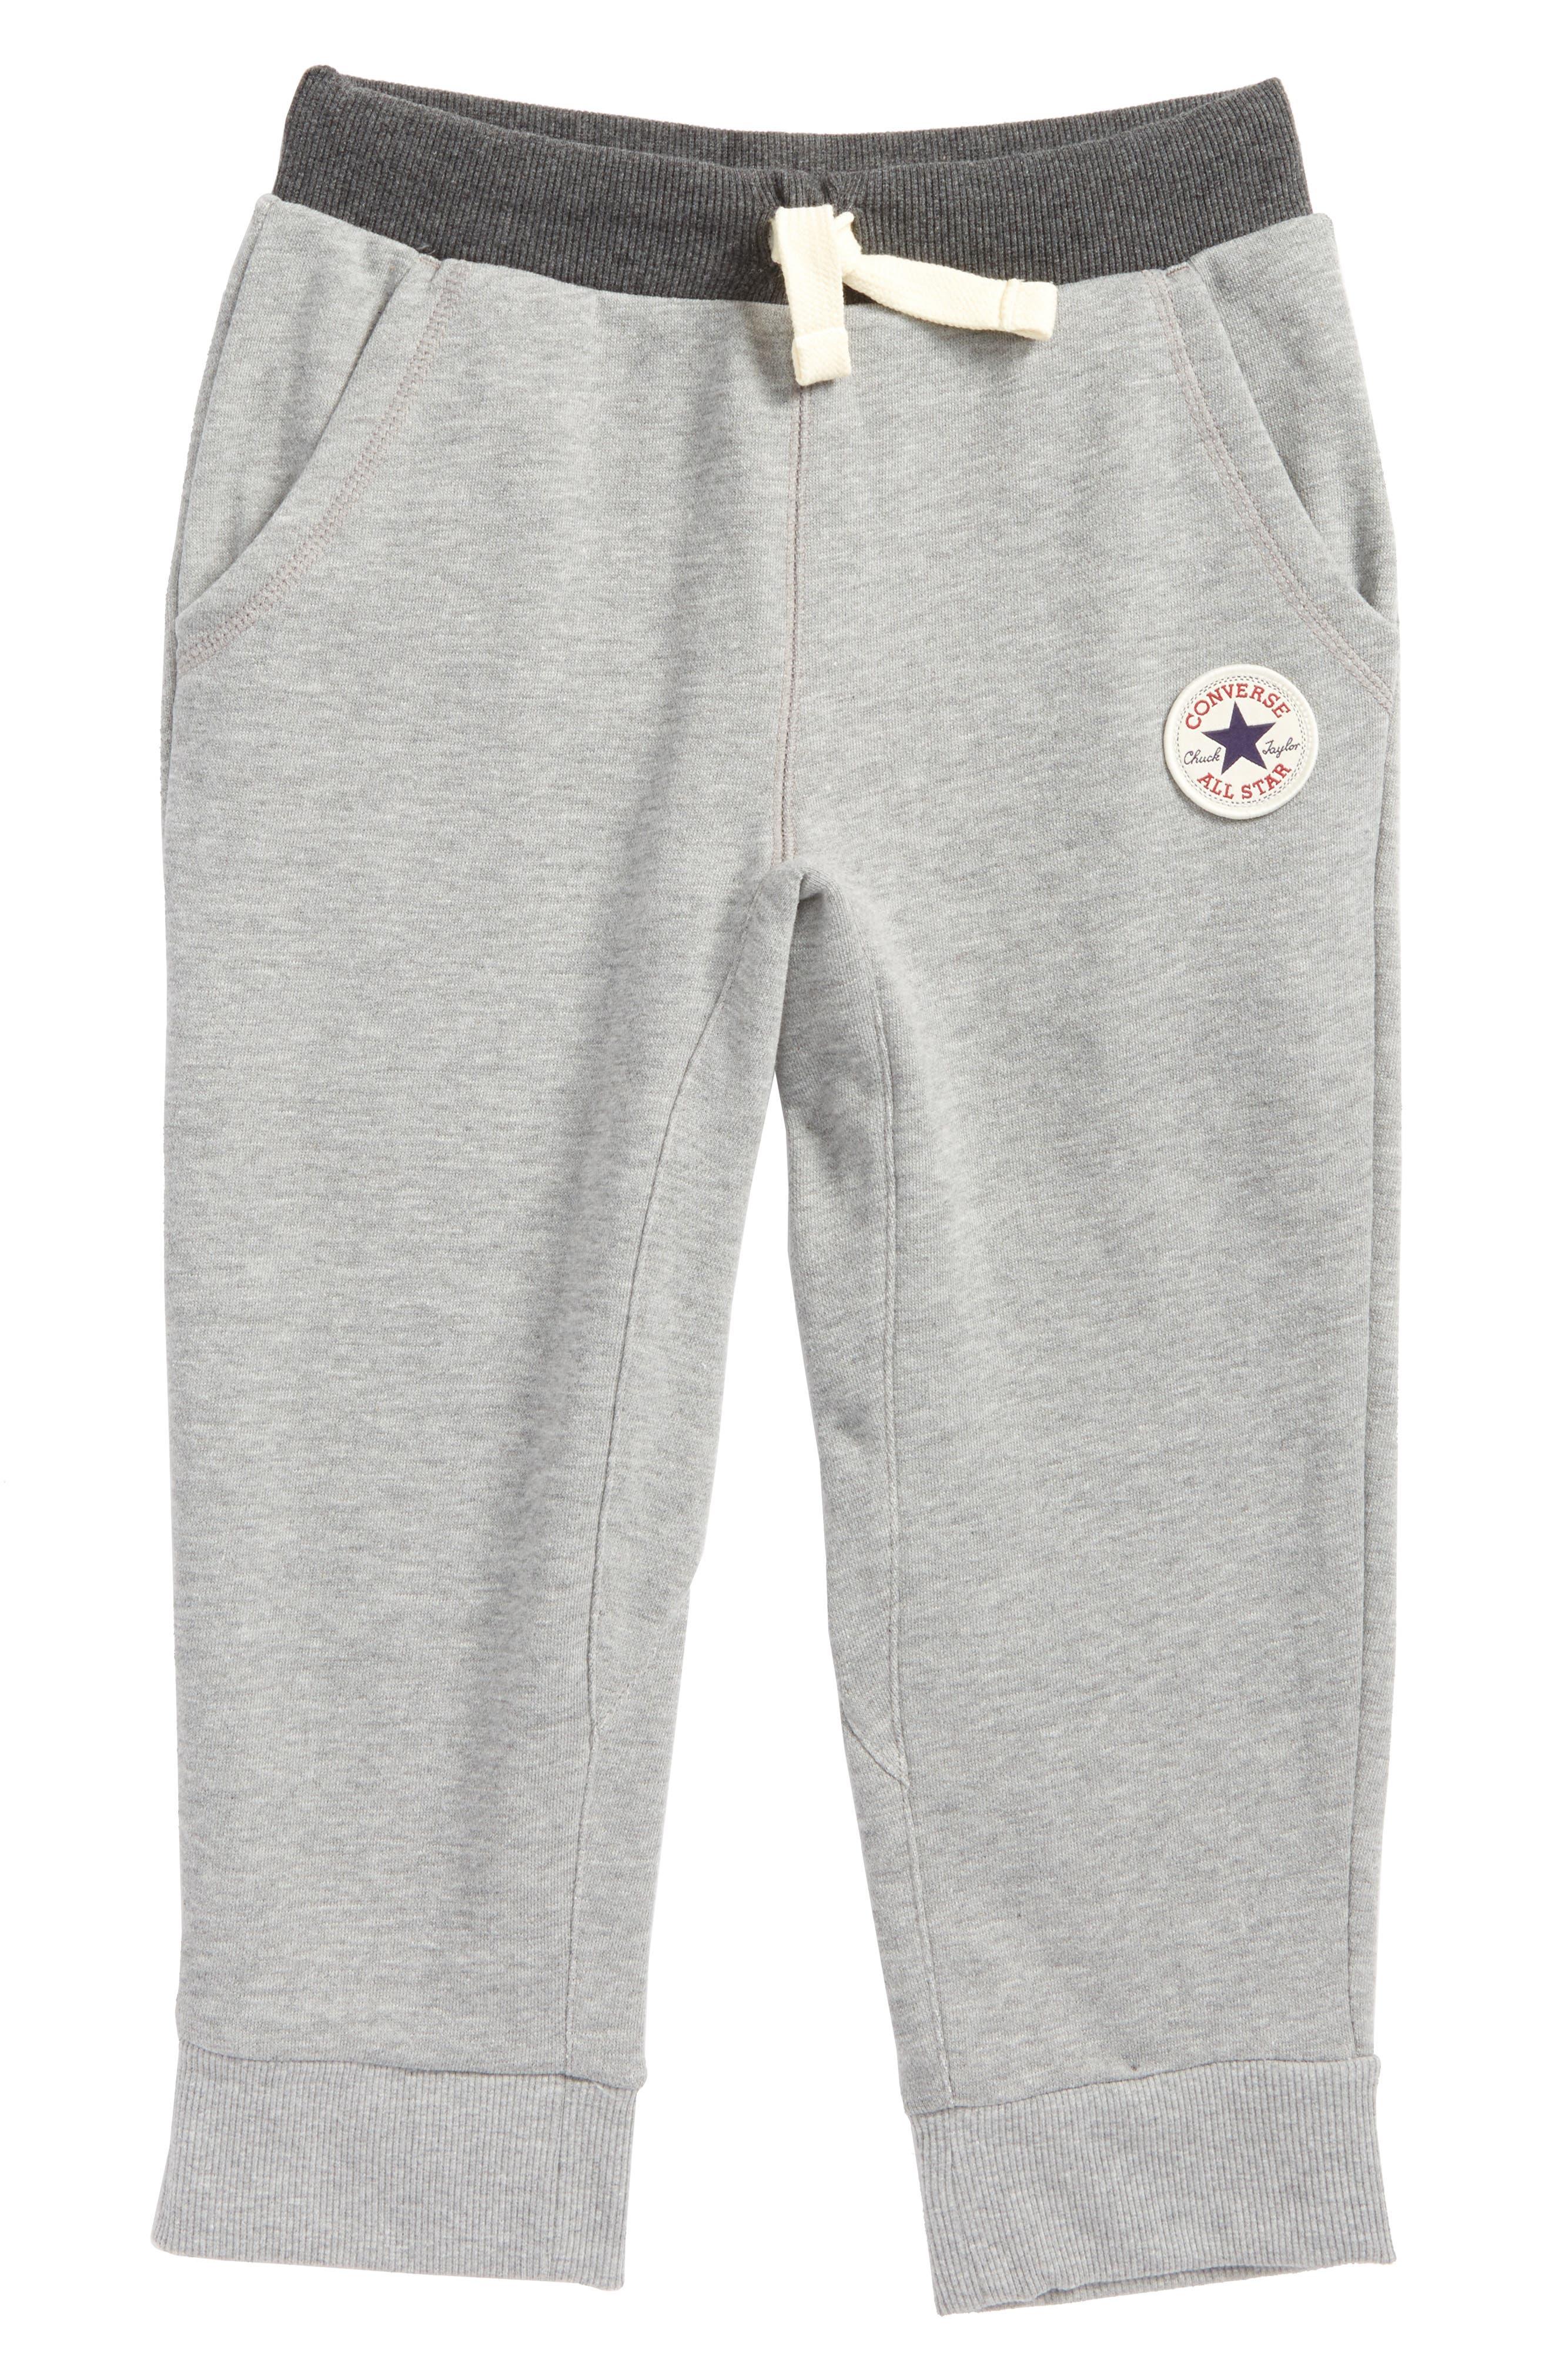 Crop Sweatpants,                         Main,                         color, 020